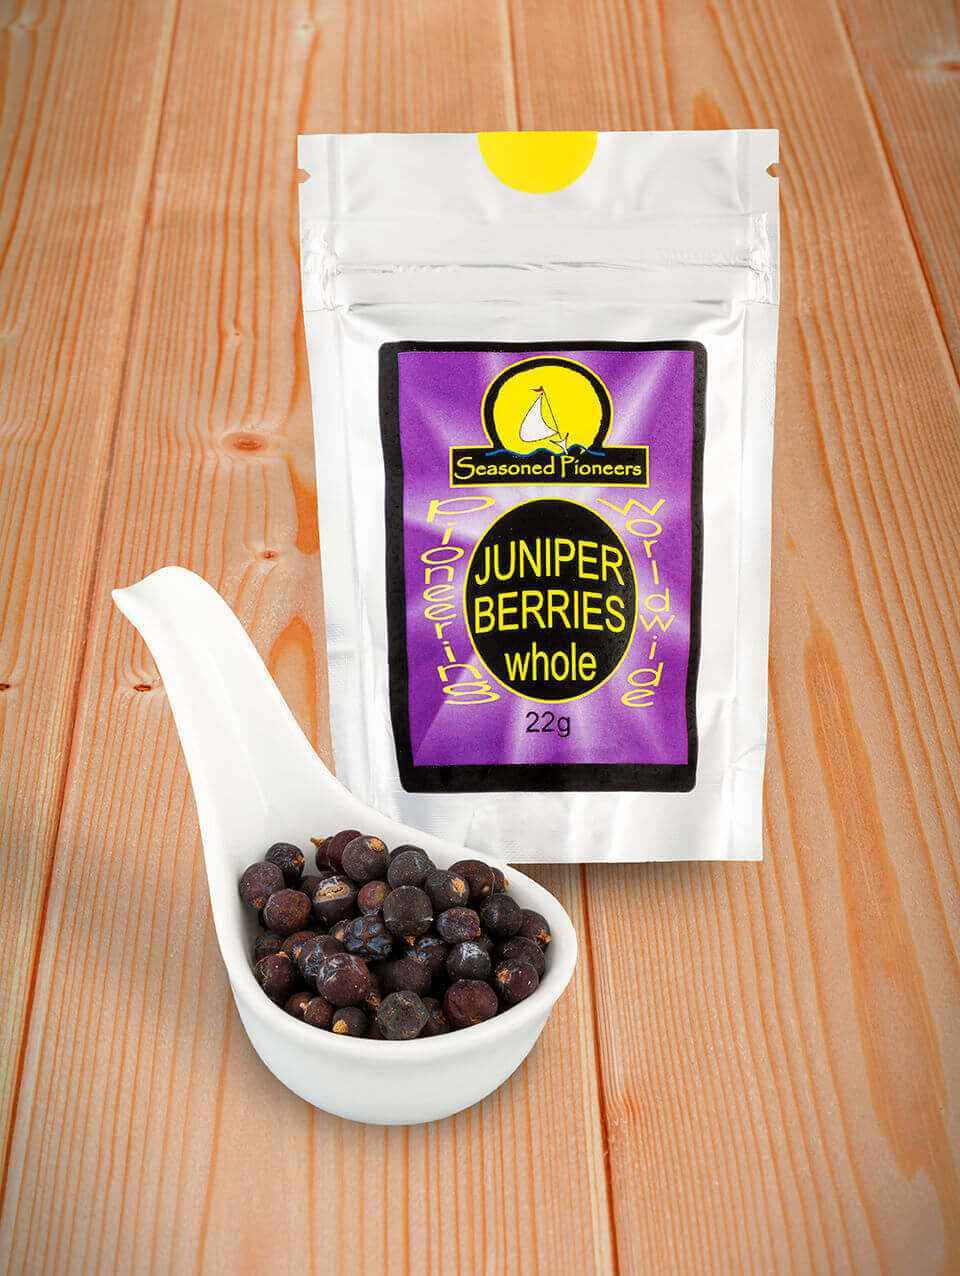 Juniper Berries Whole Juniper Berriers Buy Juniper Berries Online